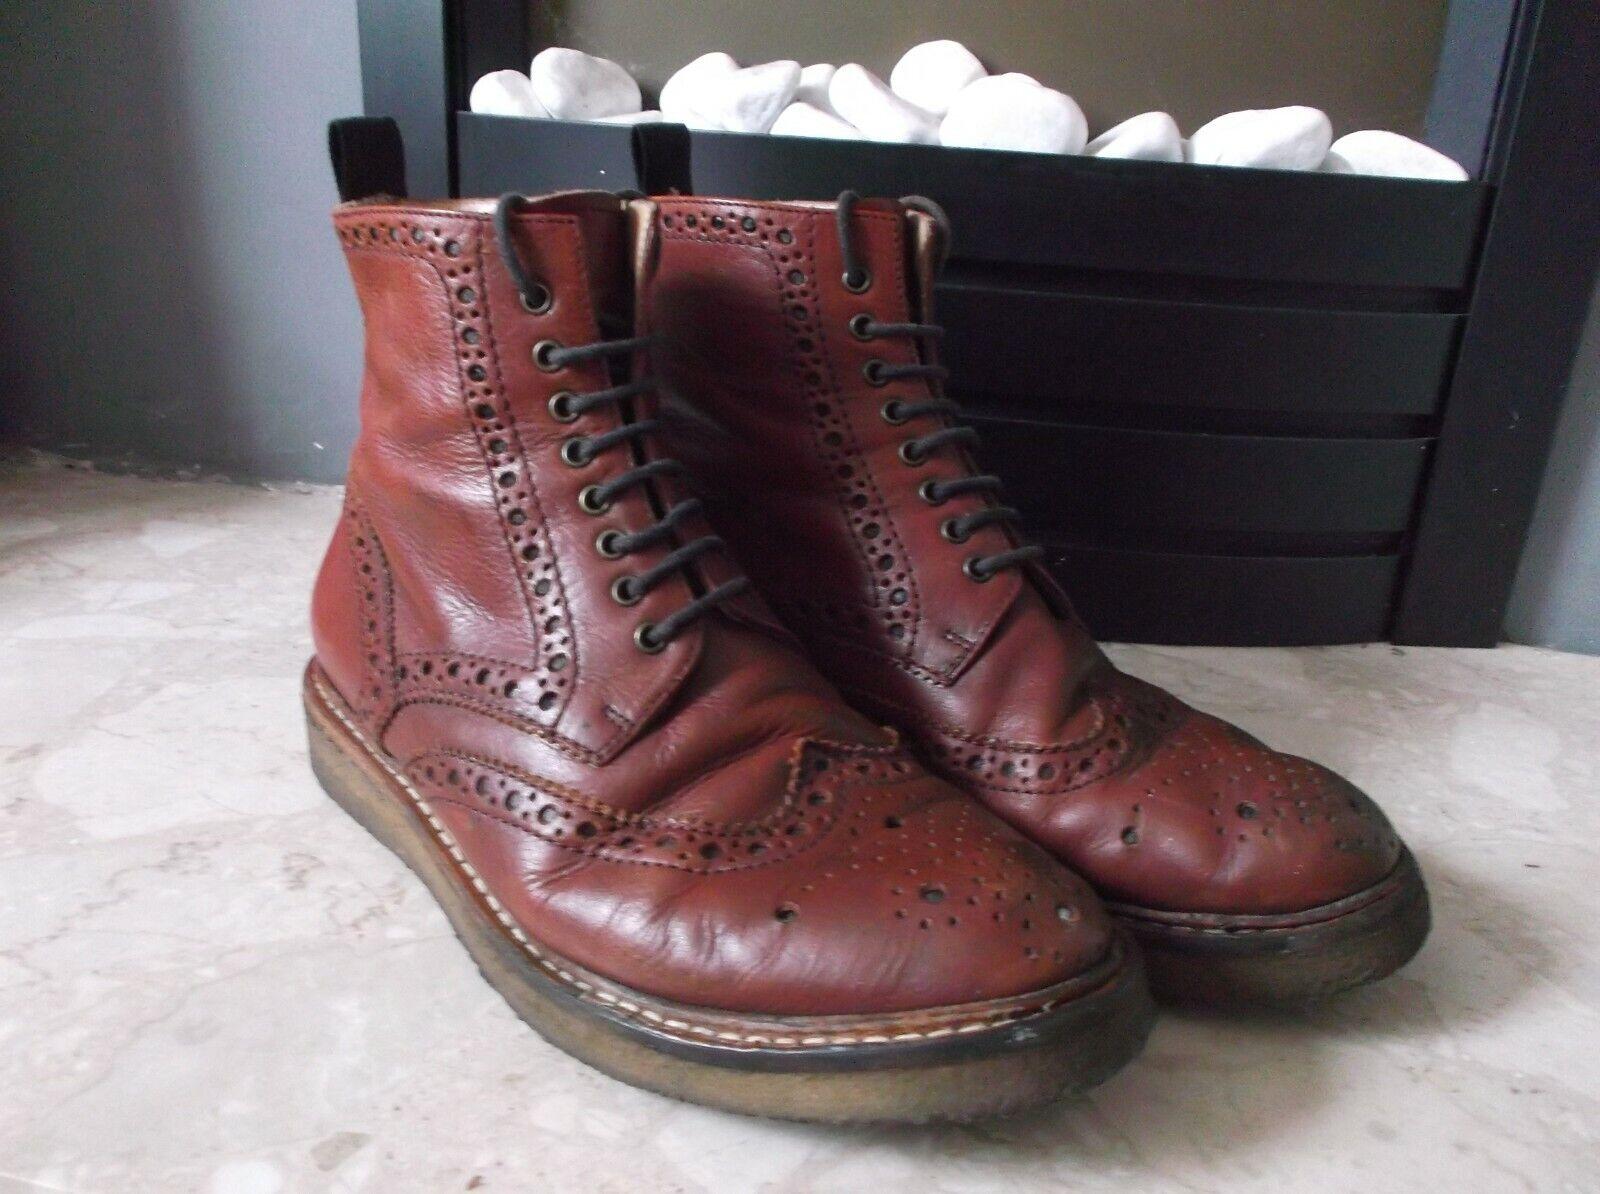 Poste Mistress Chloe Burgundy Leather Crepe Sole Brogue boots Size EU 37 UK 4